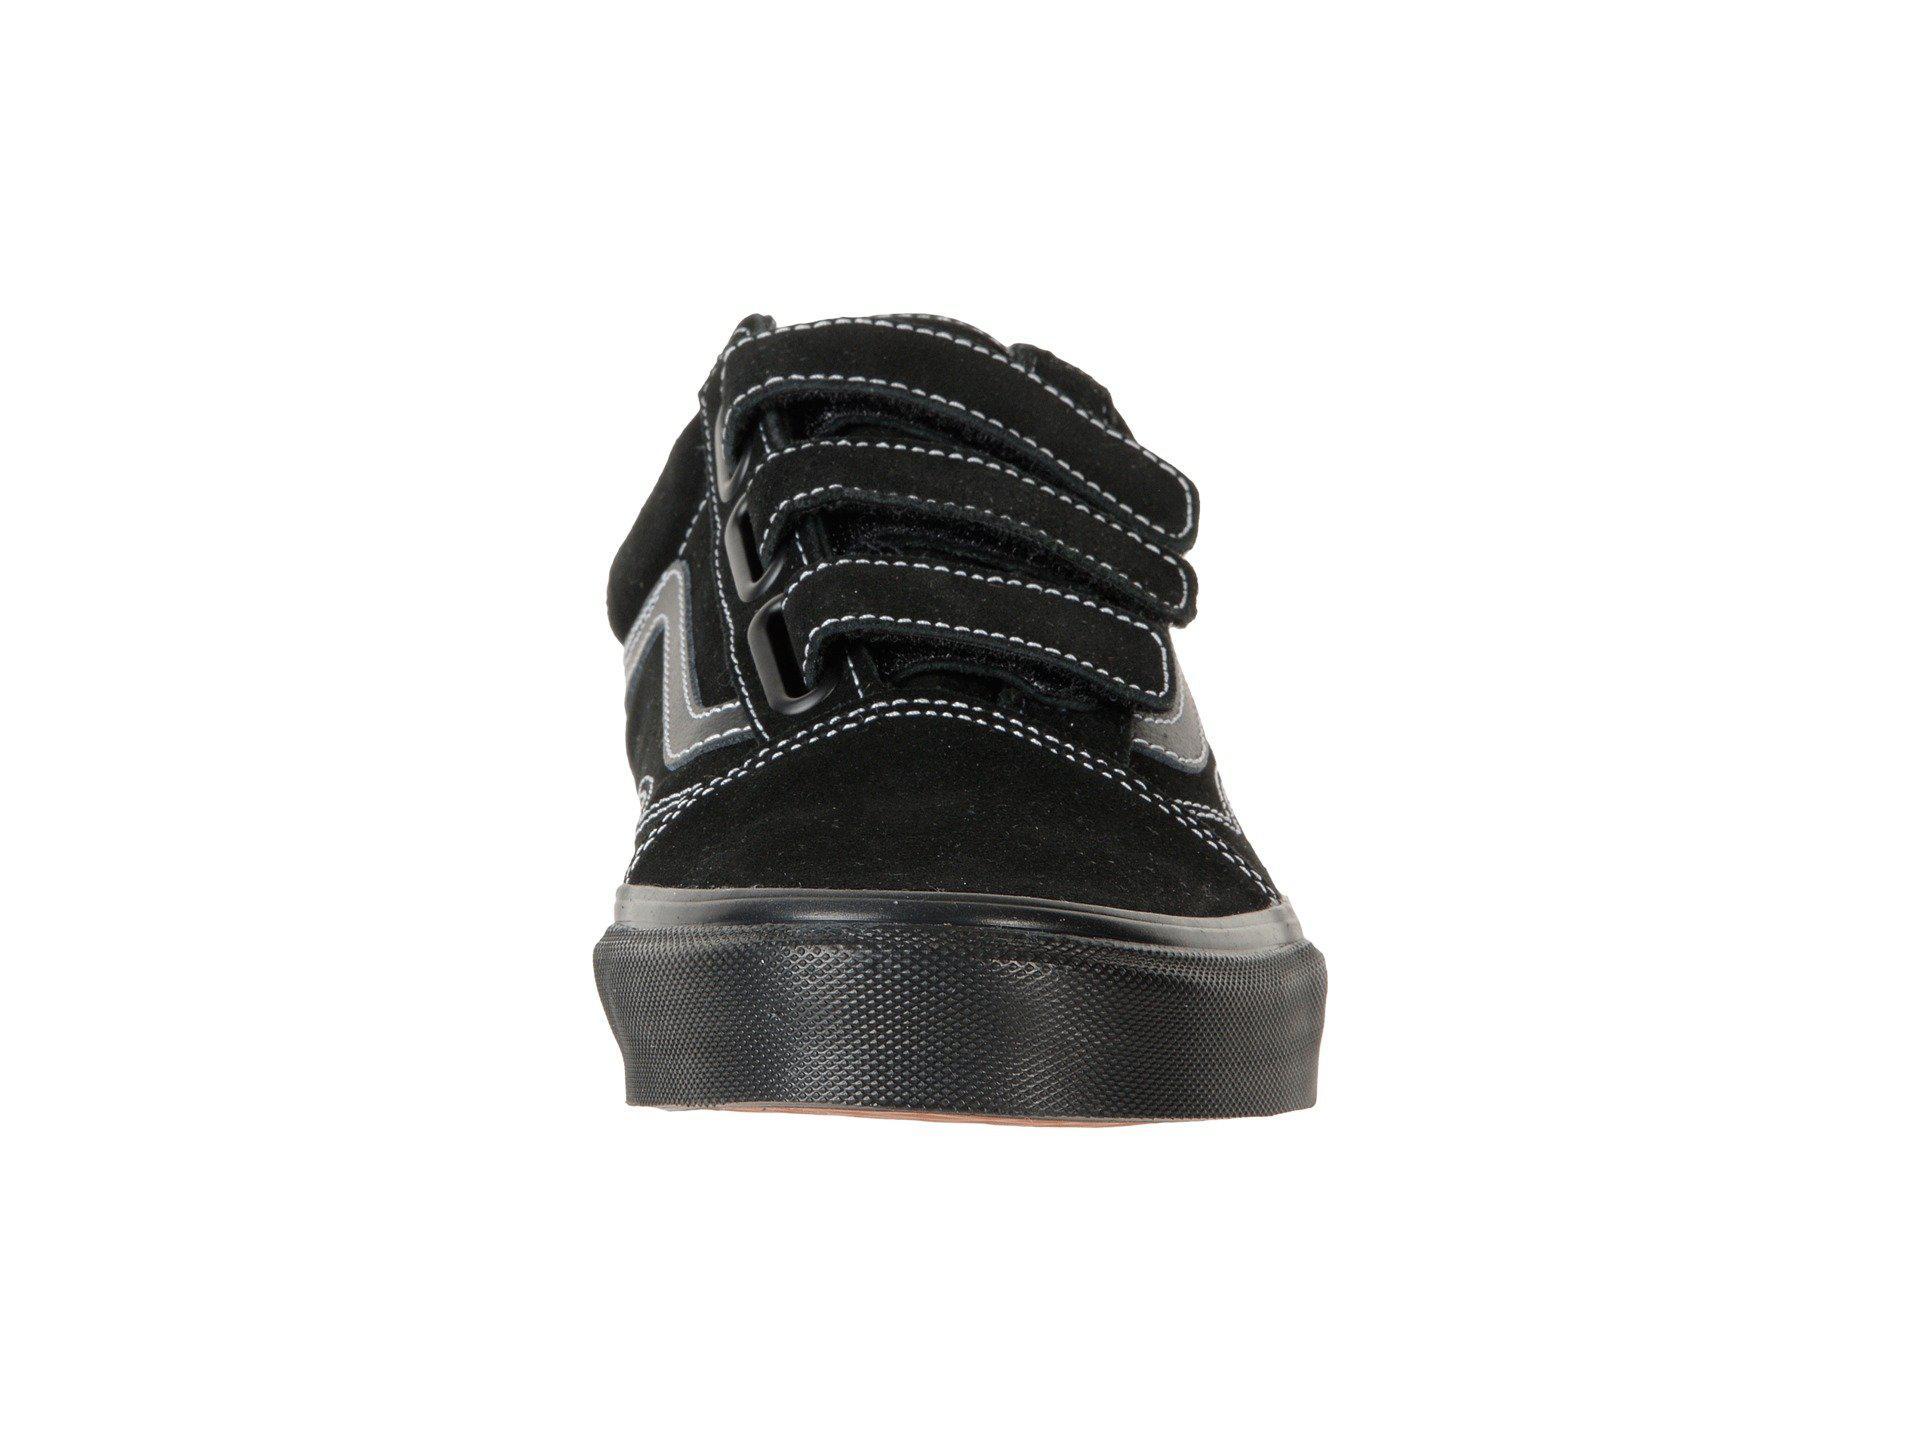 5836e340d3 Lyst - Vans Old Skool V in Black